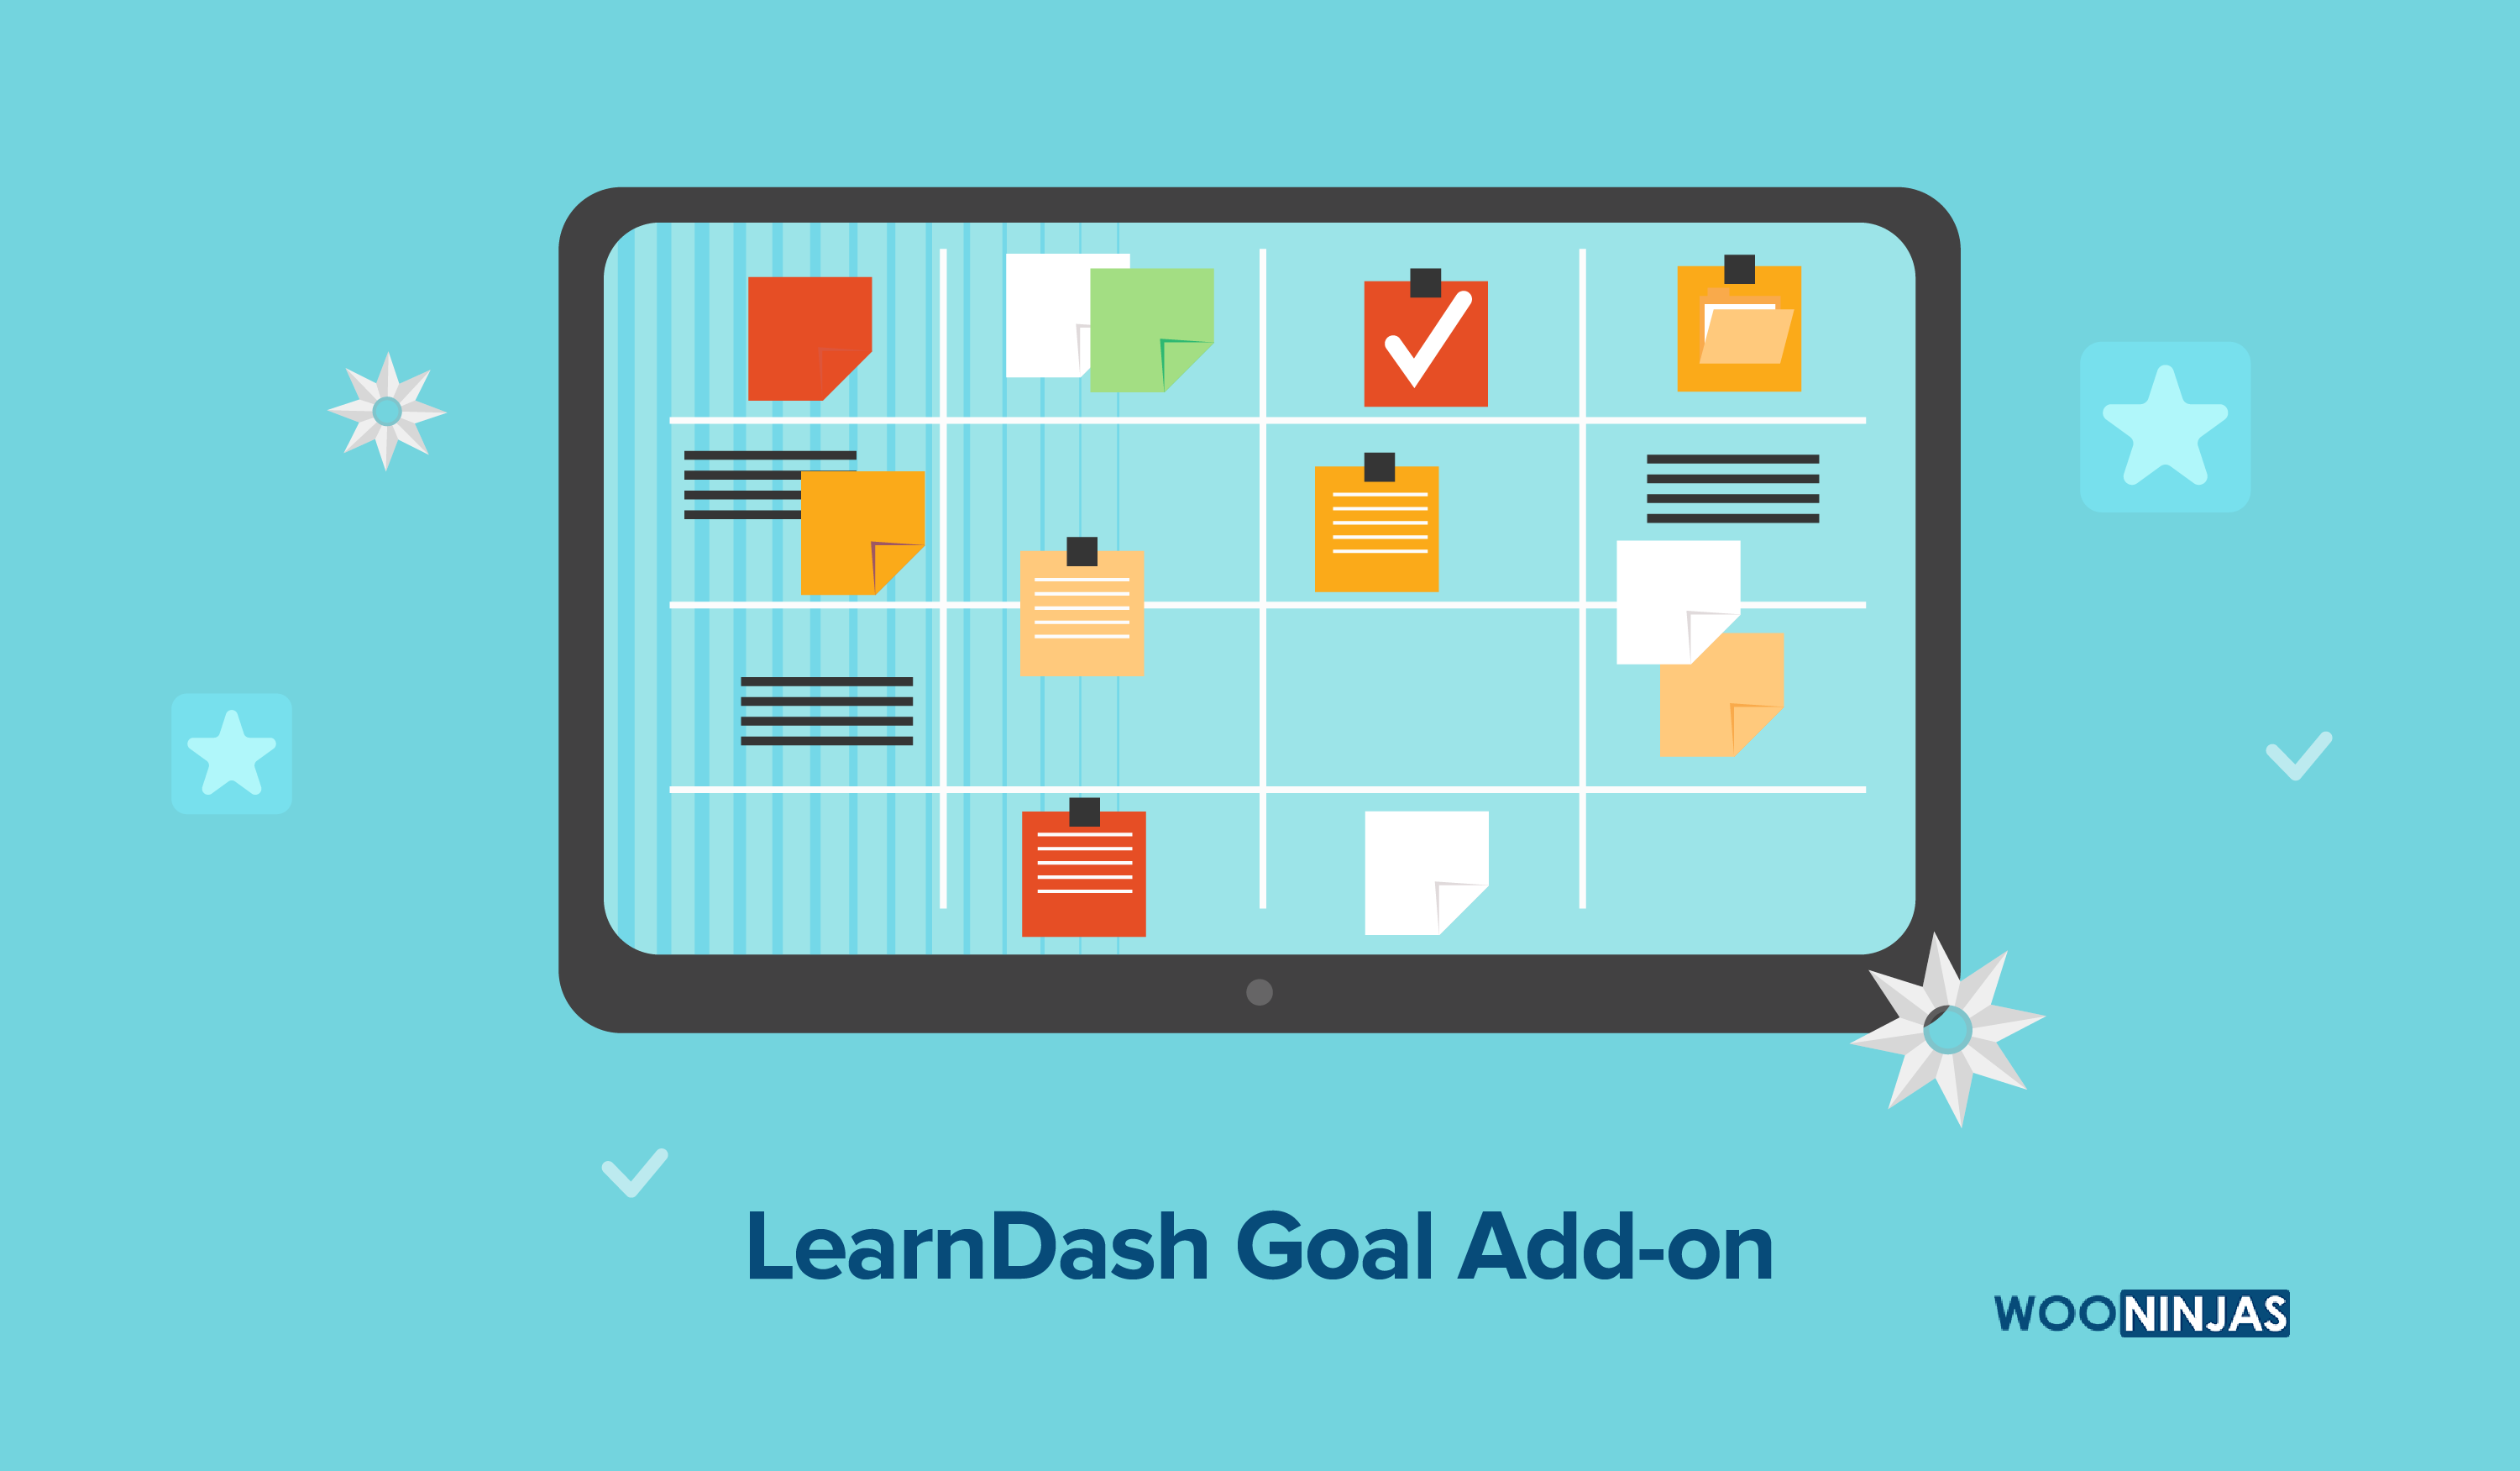 learndash goals